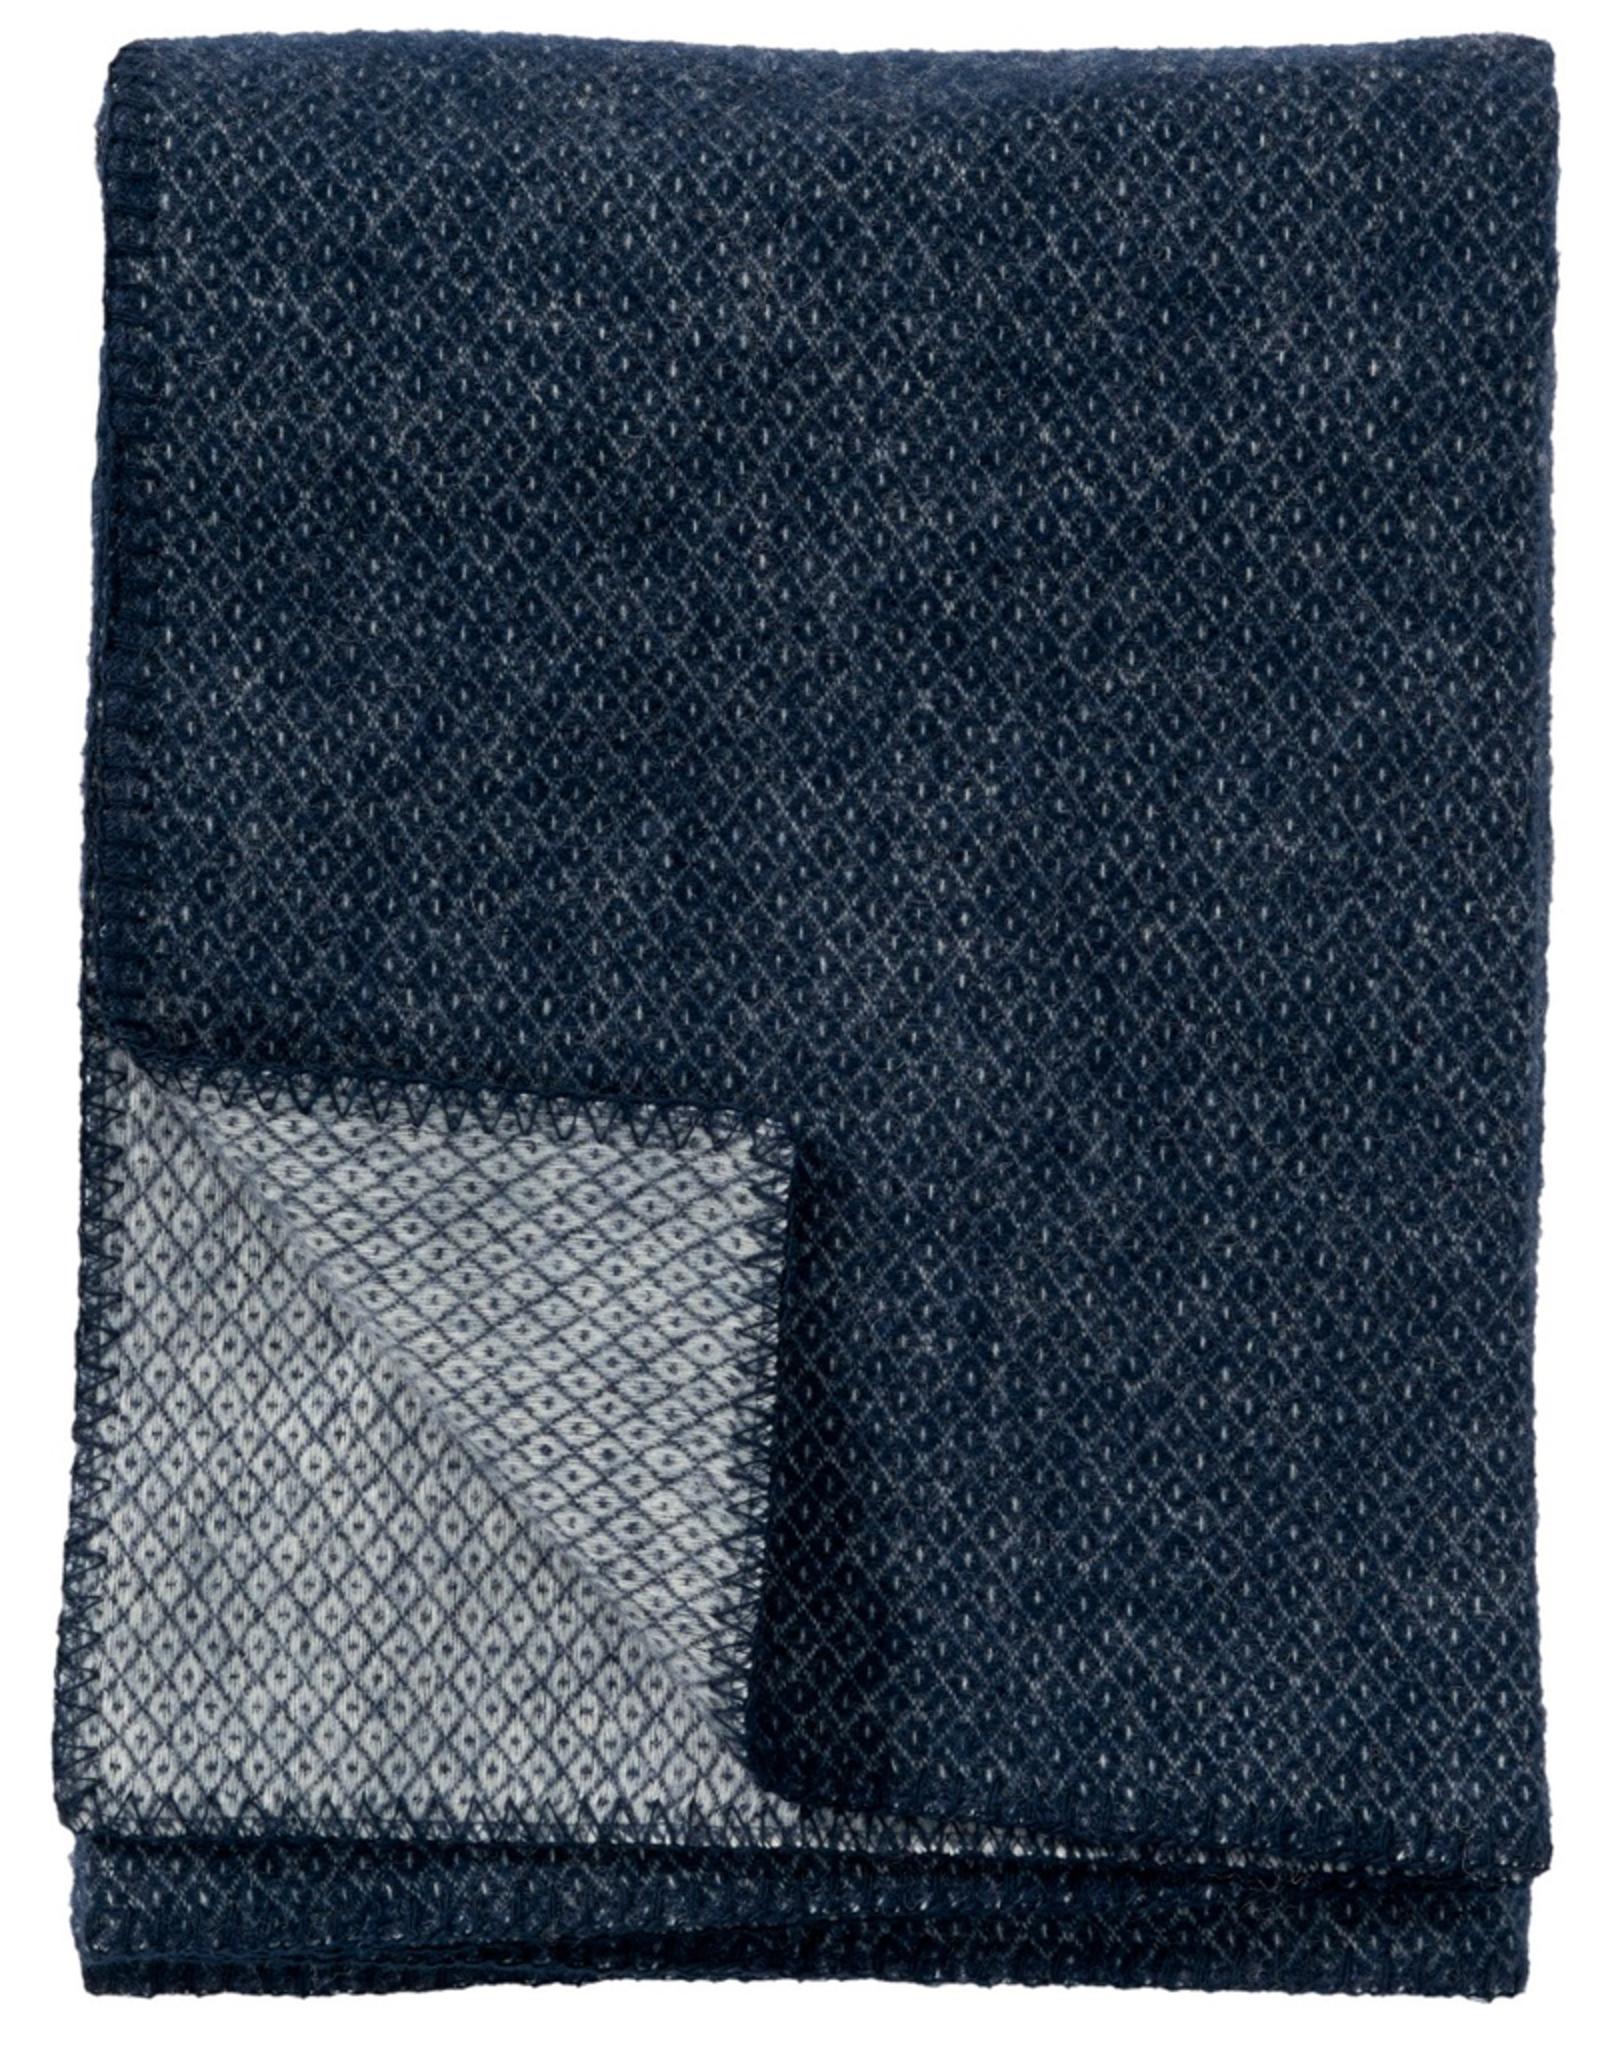 Peak Throw Denim - Brushed Merino + Lambs Wool